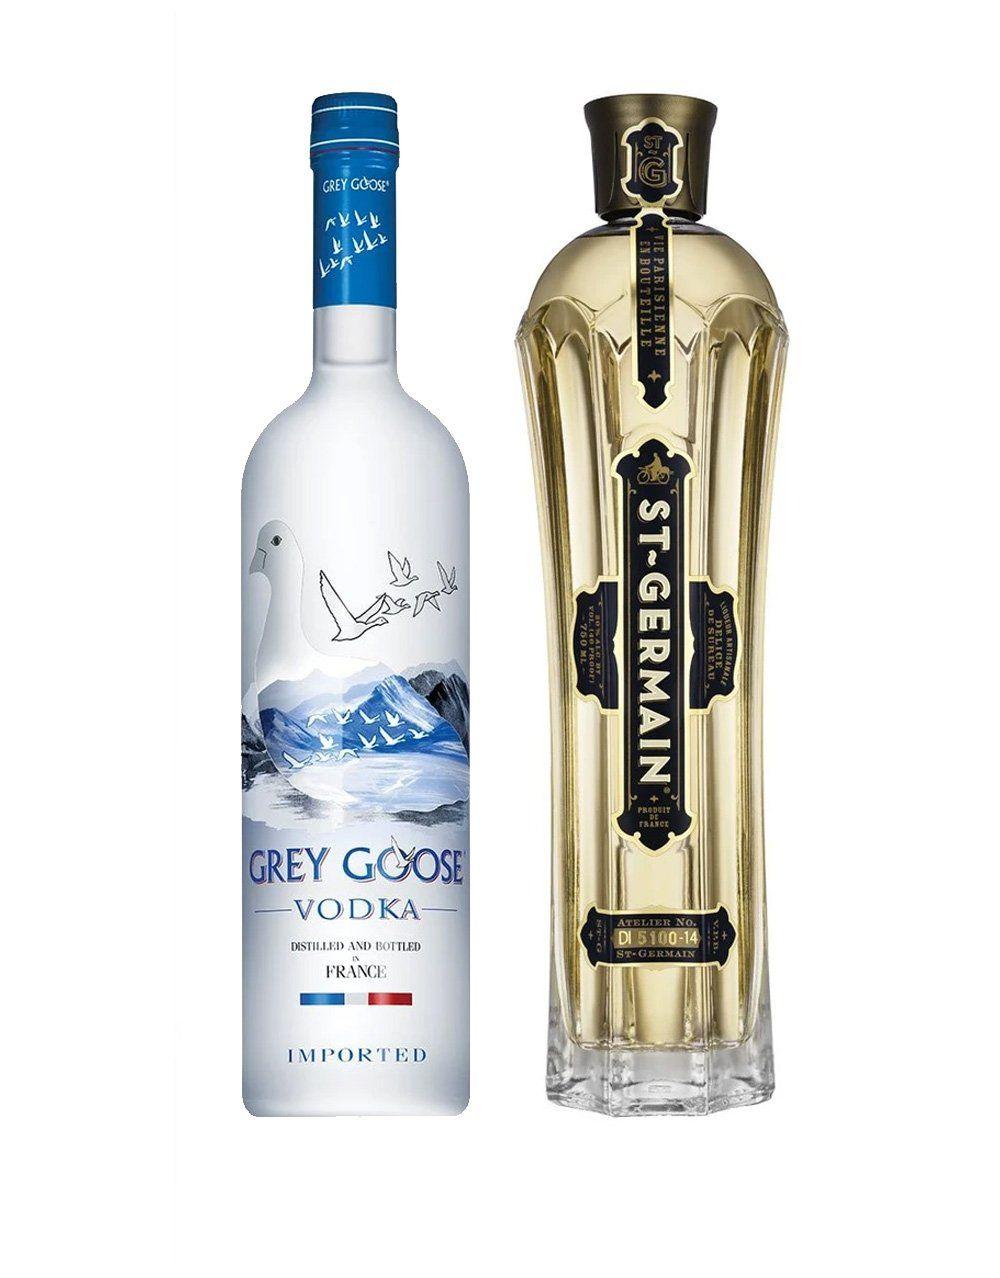 Grey Goose St Germain Spritz Kit Vodka Vodka Brands Grey Goose